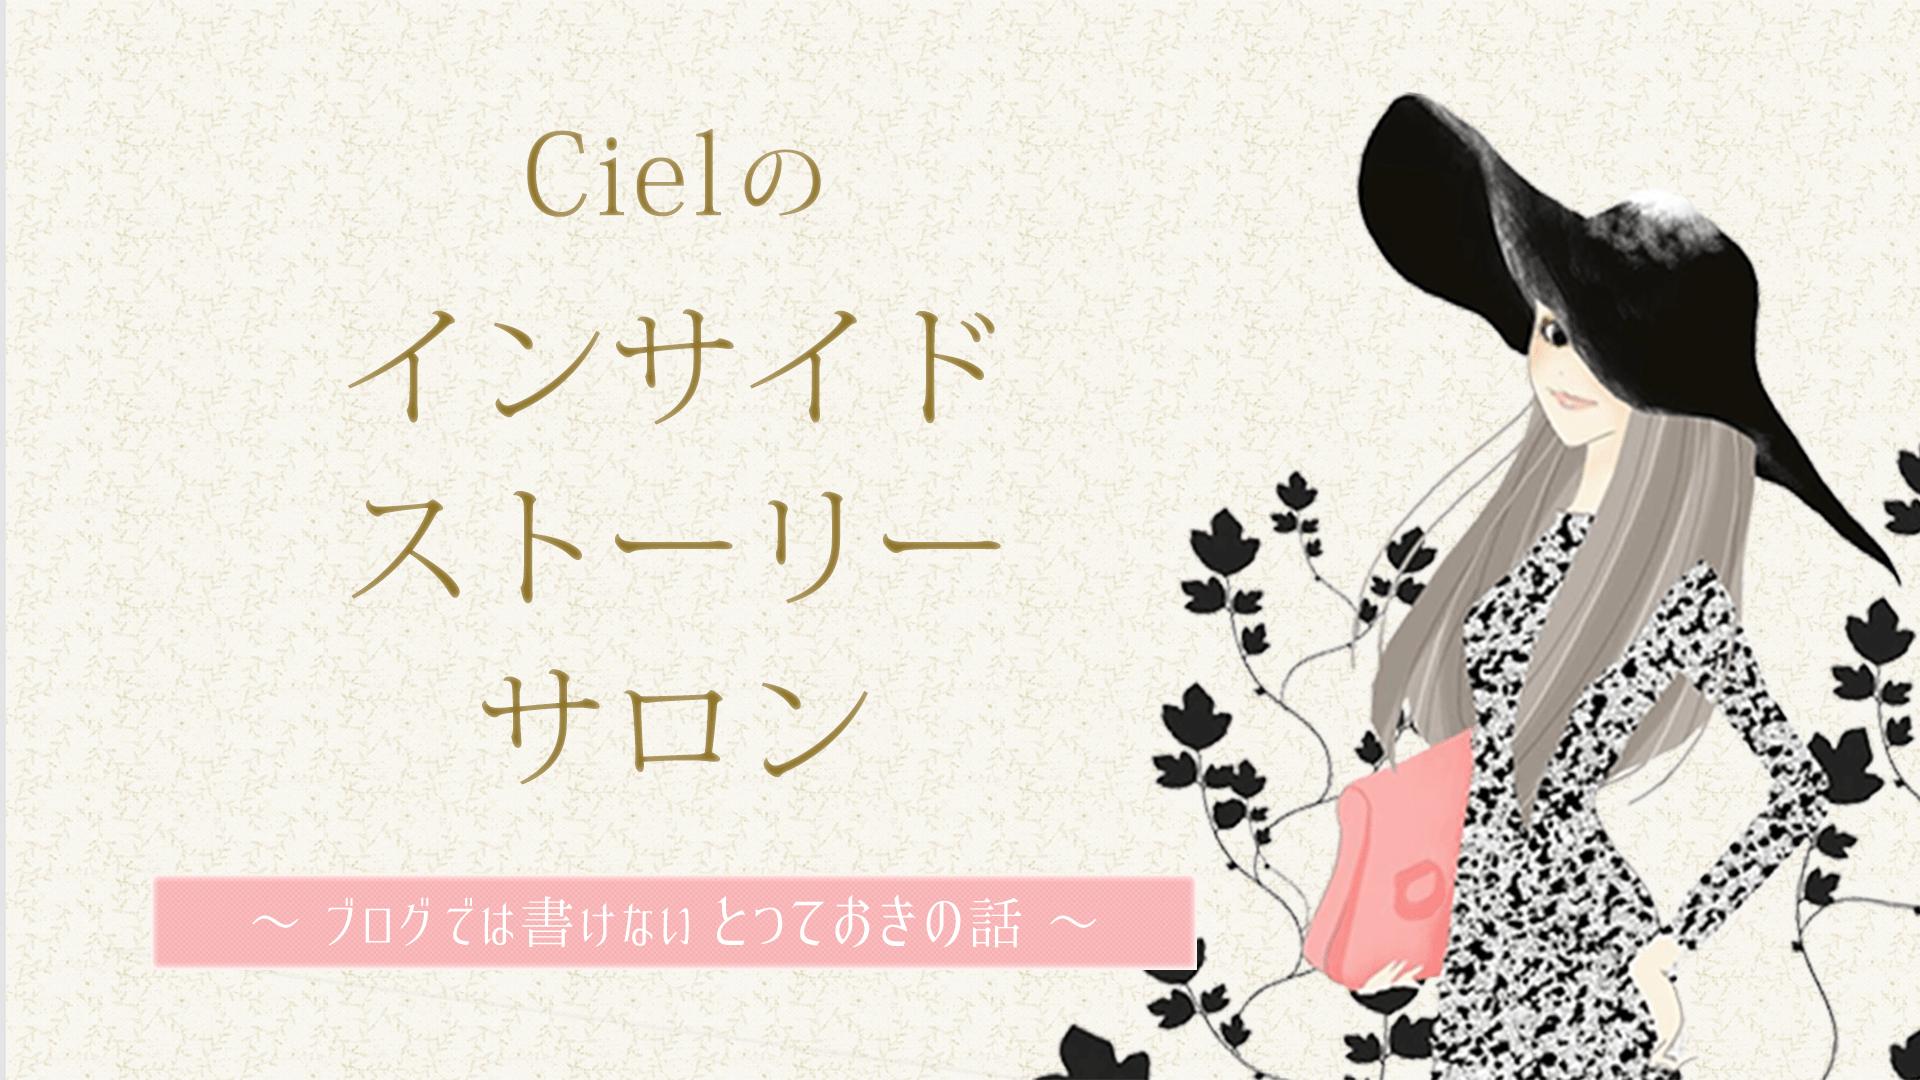 Ciel Cielのインサイドストーリーサロン Öログでは書けないとっておきの話 Dmm ªンラインサロン